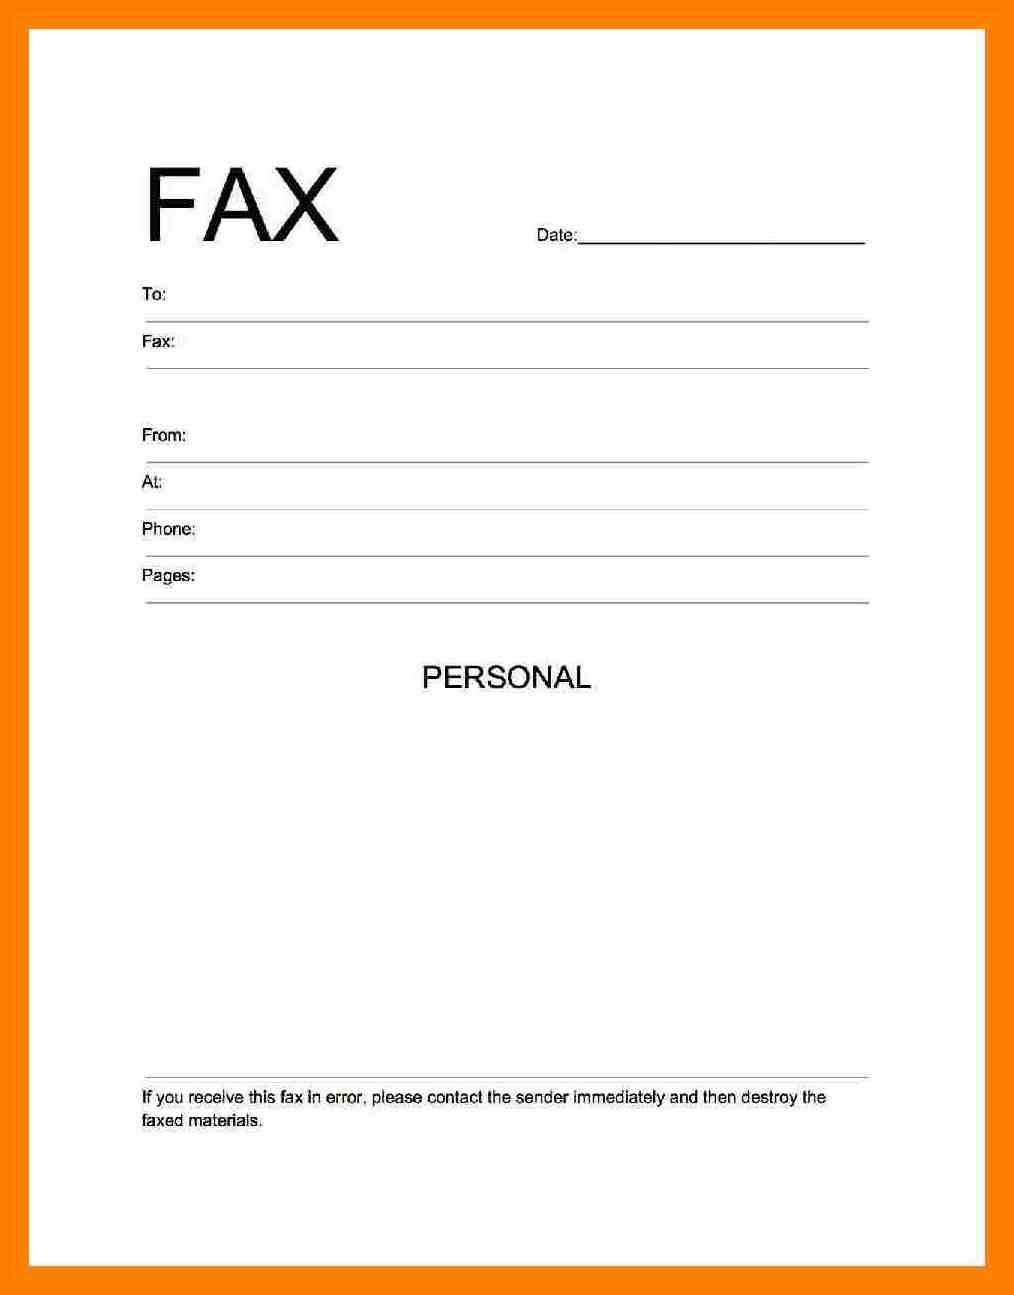 Fax Cover Sheet Pdf Free Download - Free Printable Fax Cover Sheet Pdf